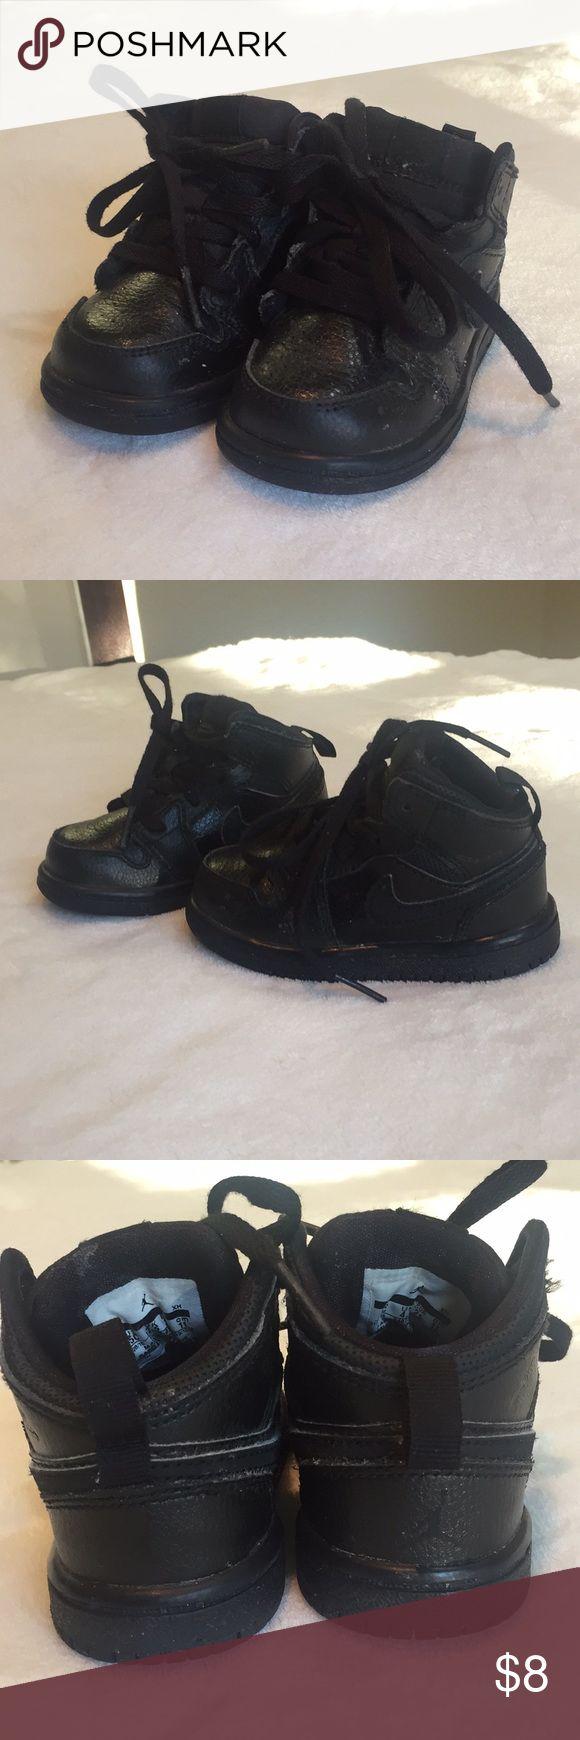 Used toddler Jordan 1s Used toddler Jordan 1s. All black. Size 5c. Jordan Shoes Sneakers